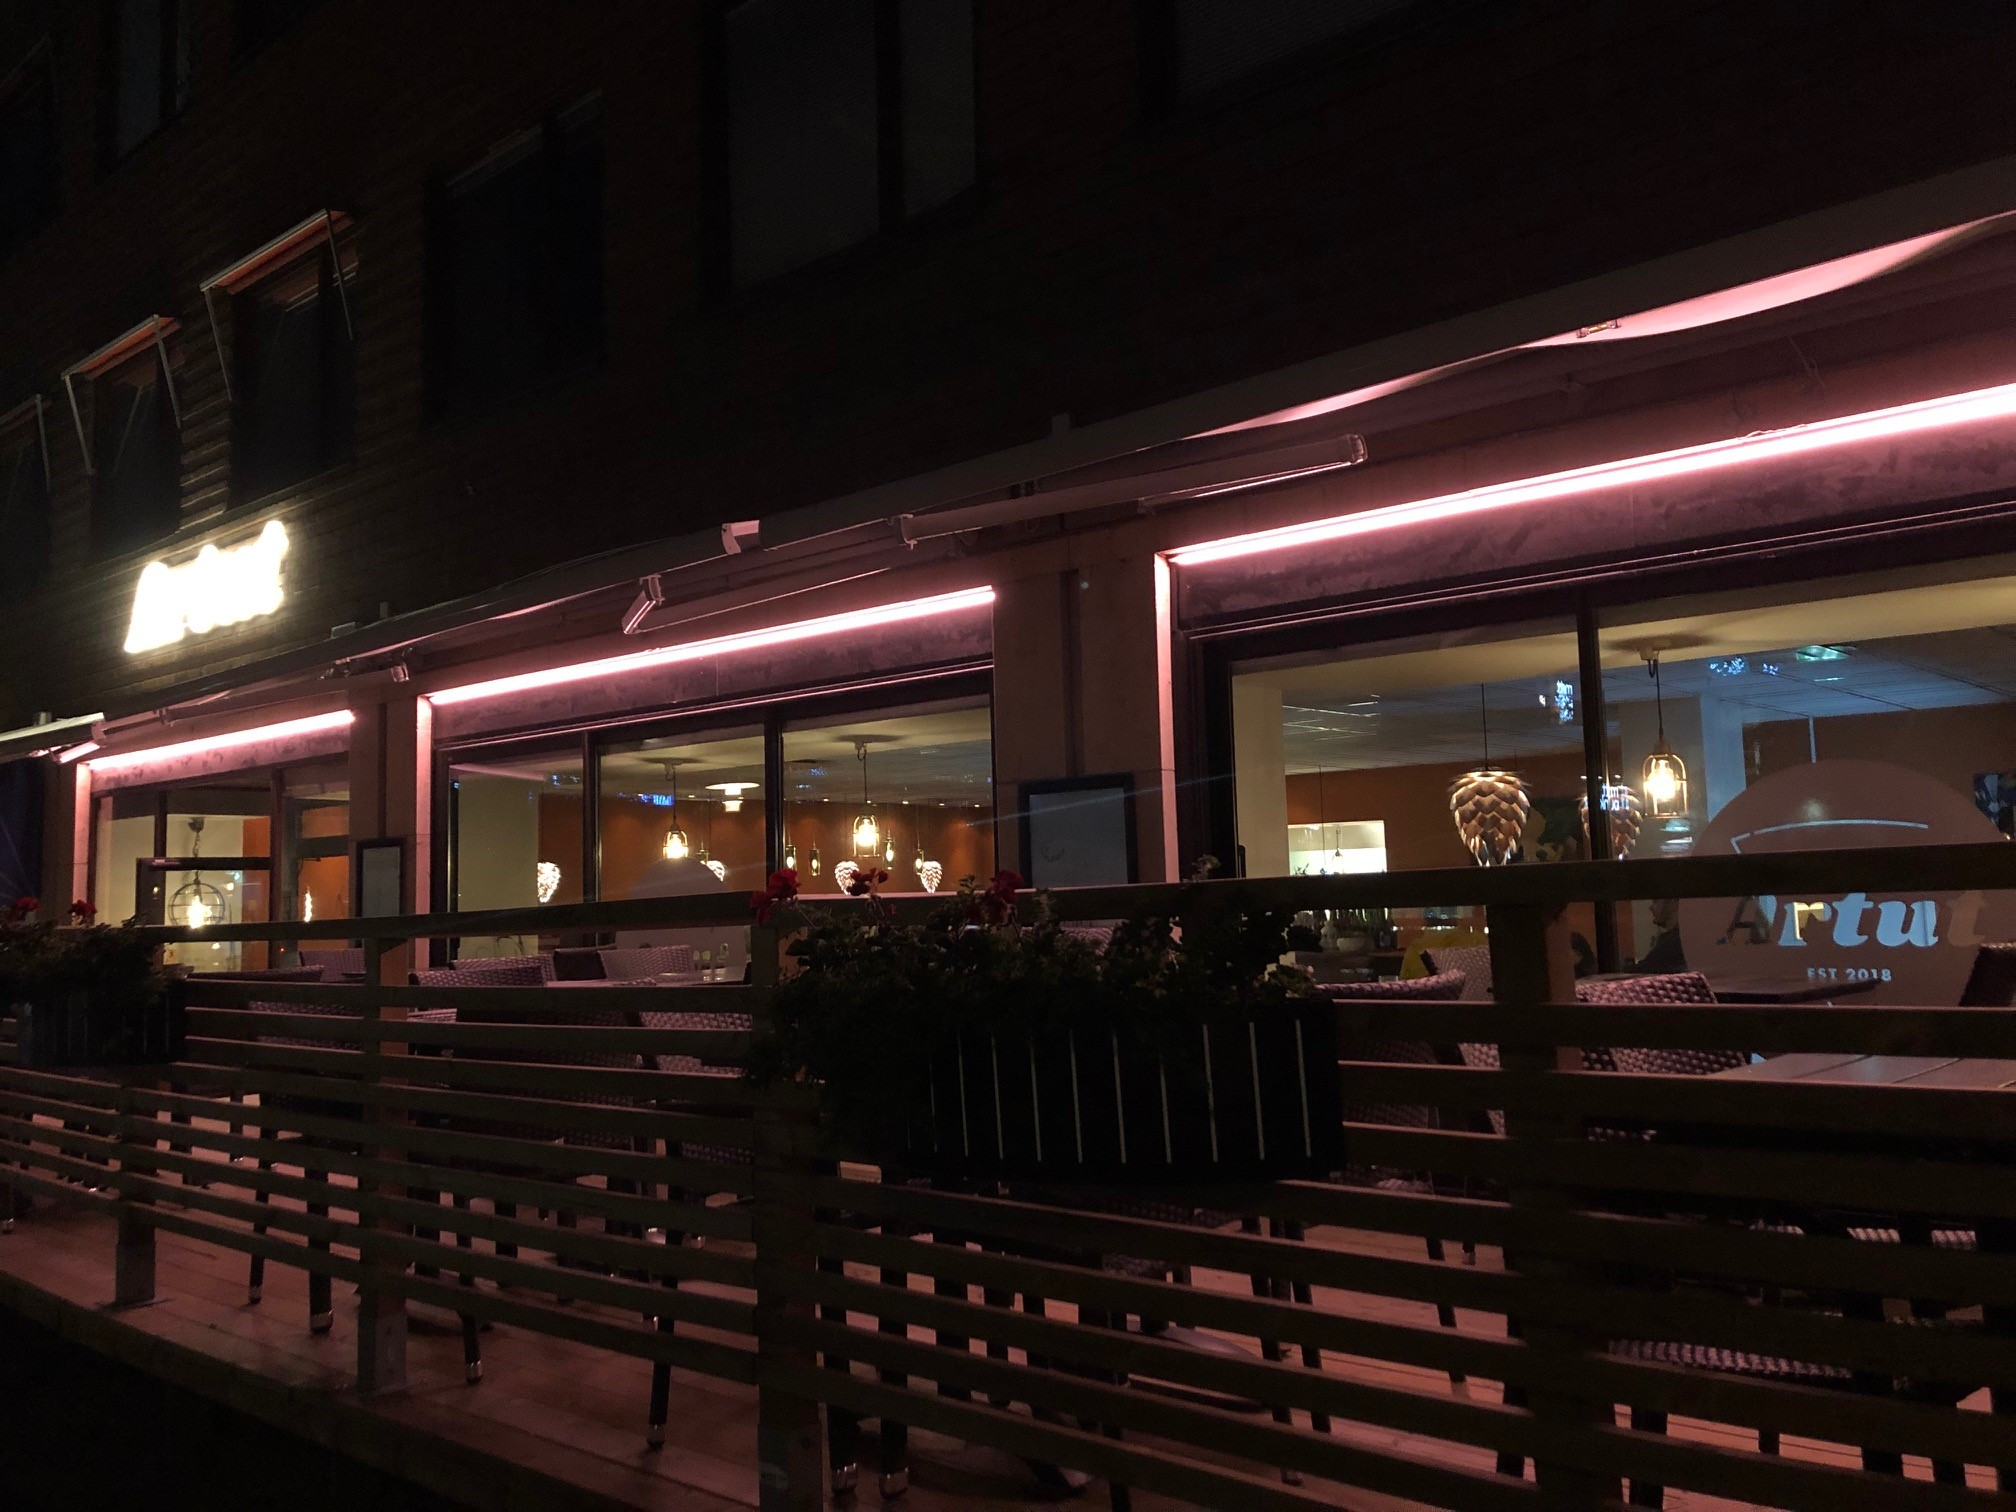 Belysning uteservering fasad (RGB)